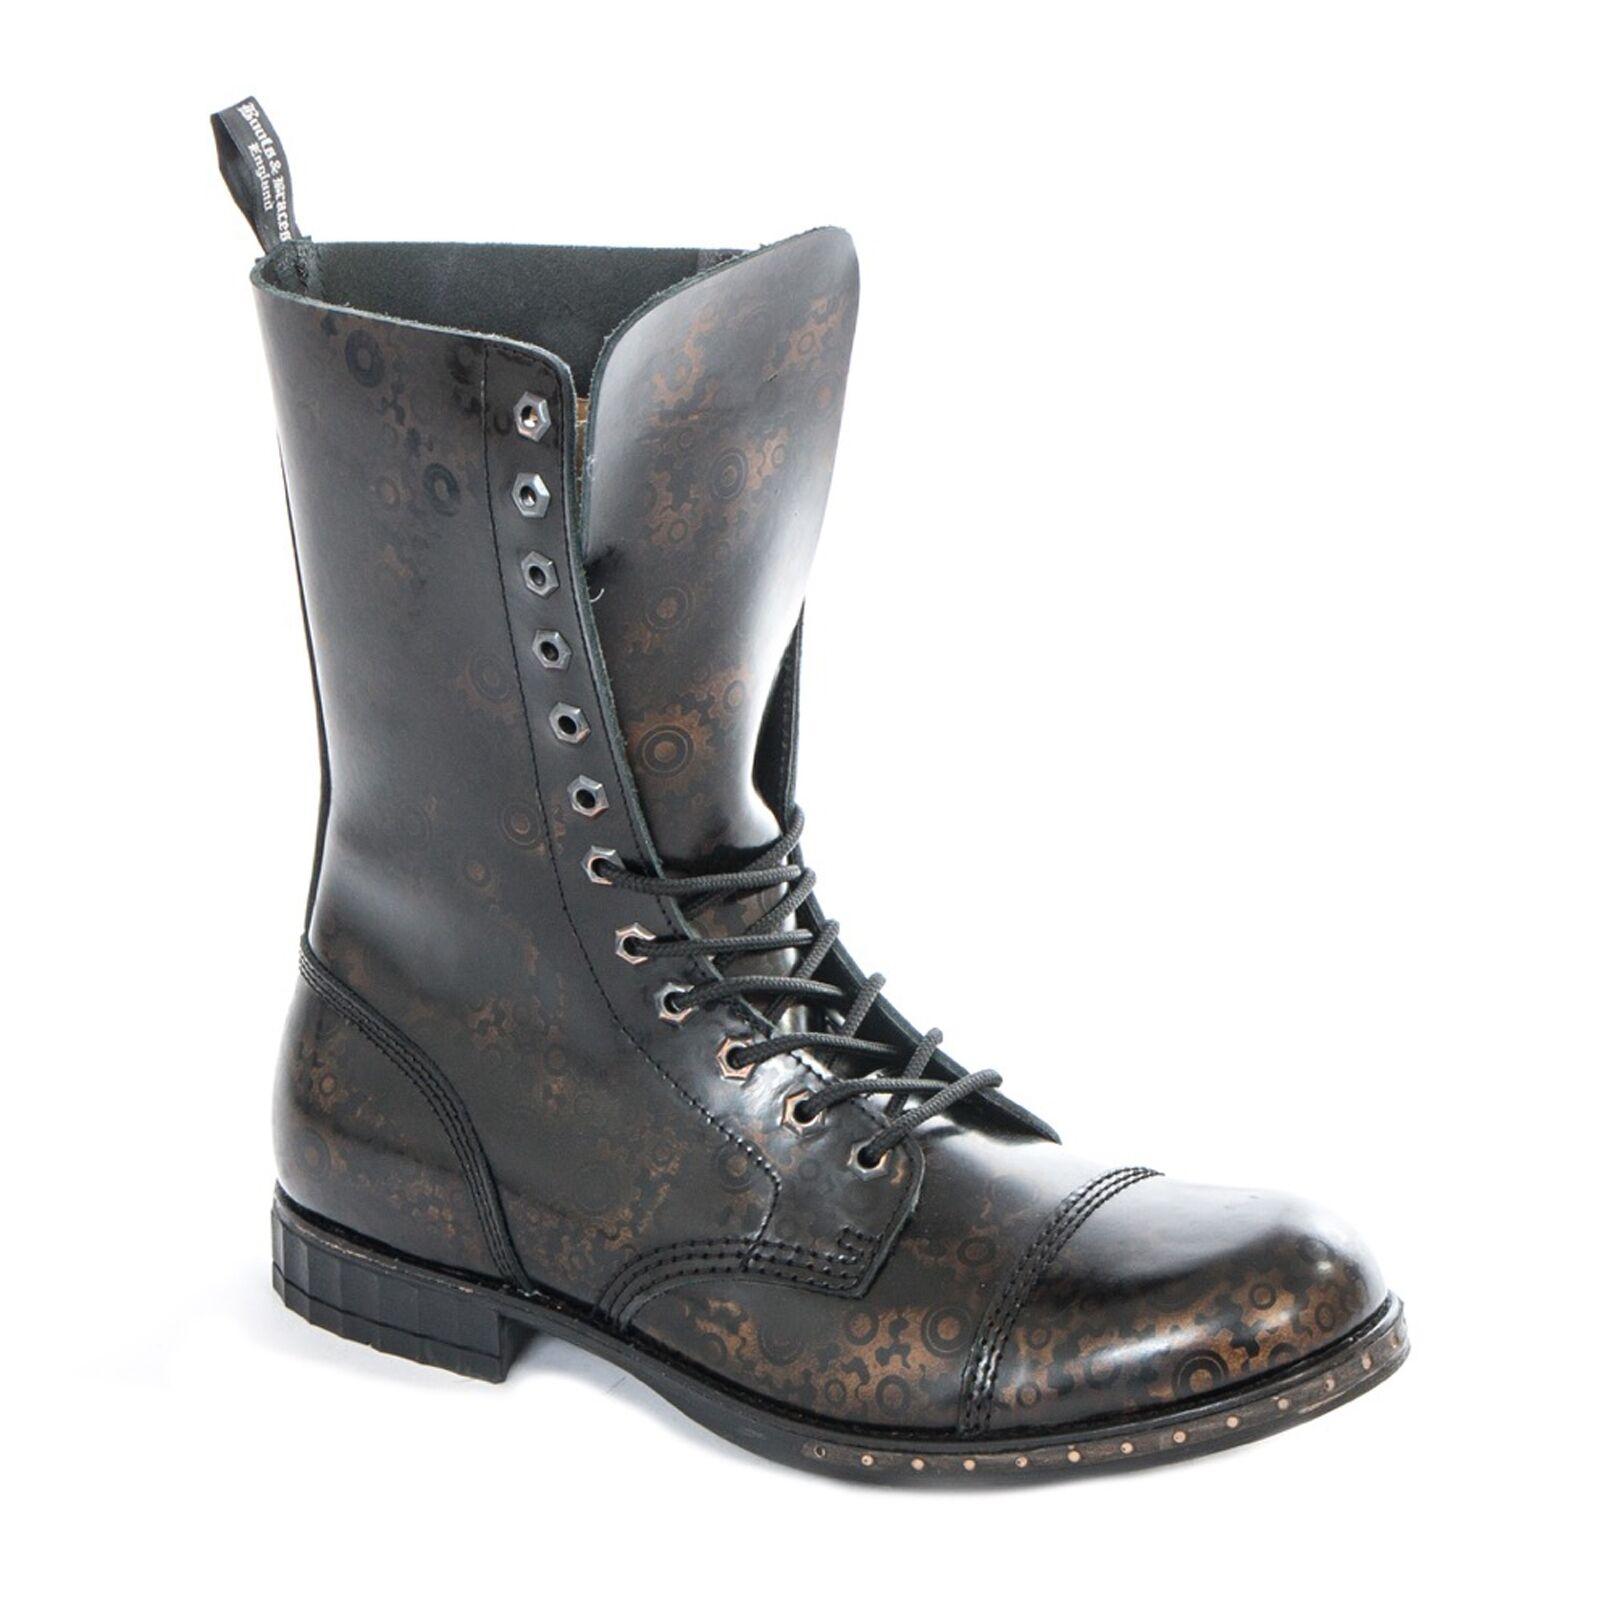 Stiefel & Braces - 12 Loch Steampunk GEAR Schuhe Gothik Ranger Steam Punk Leder MA